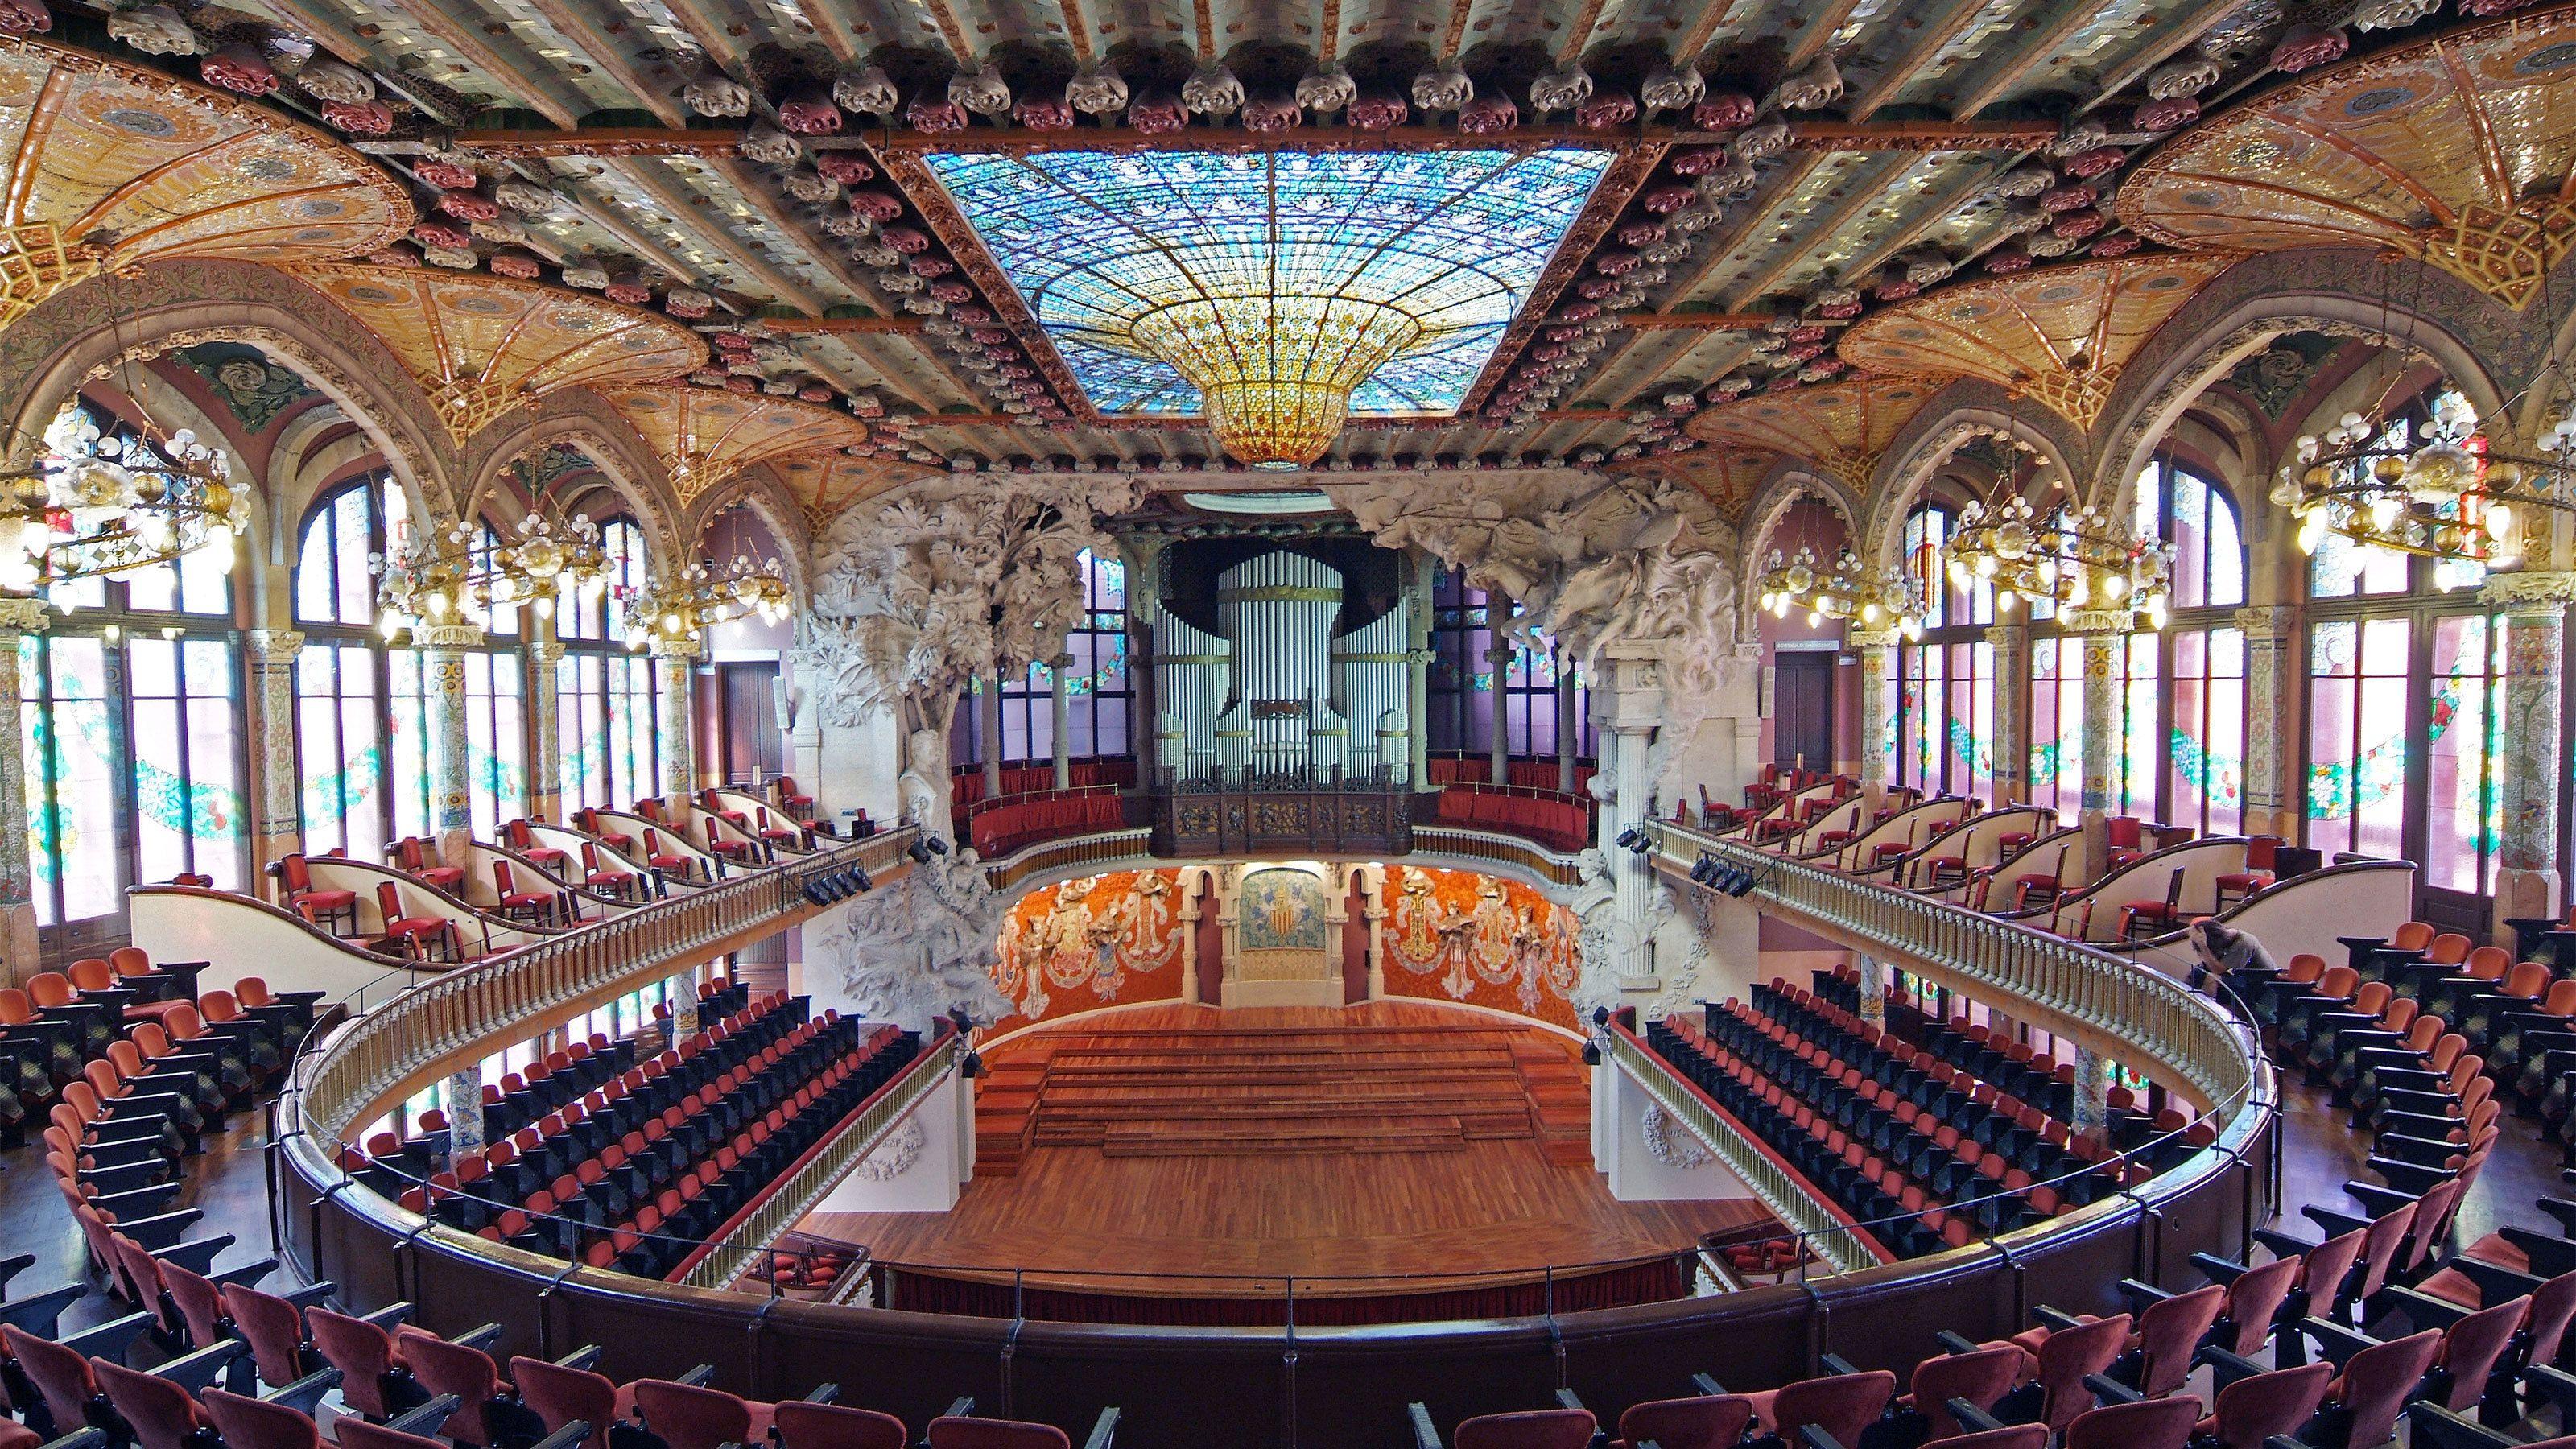 Spring køen over: Rundvisning på Palau de la Música Catalana